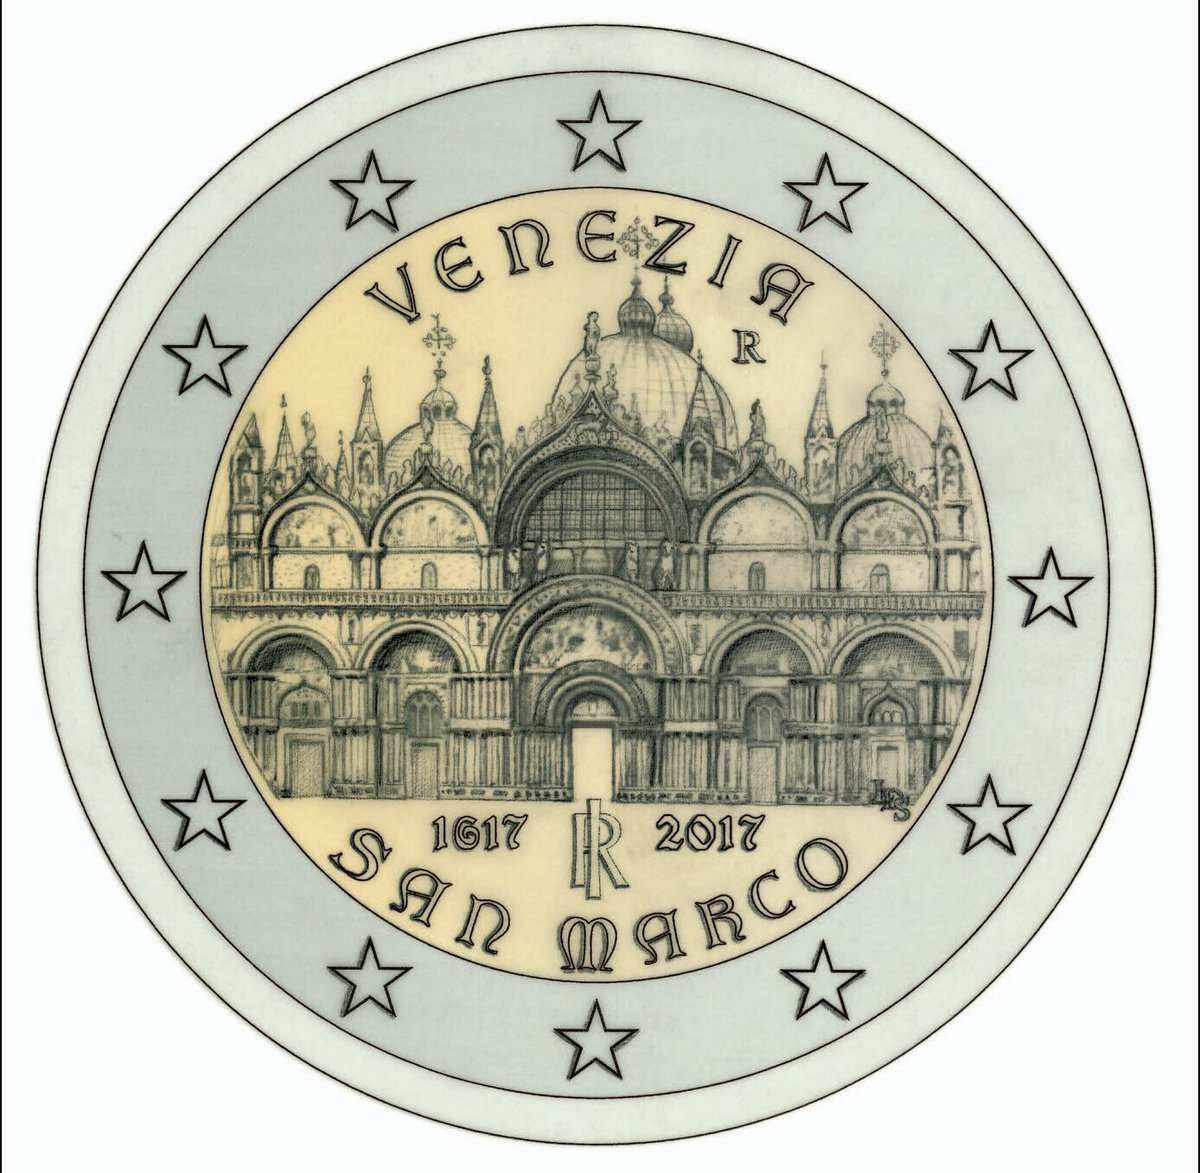 sar dedicata a venezia la nuova moneta da 2 euro. Black Bedroom Furniture Sets. Home Design Ideas